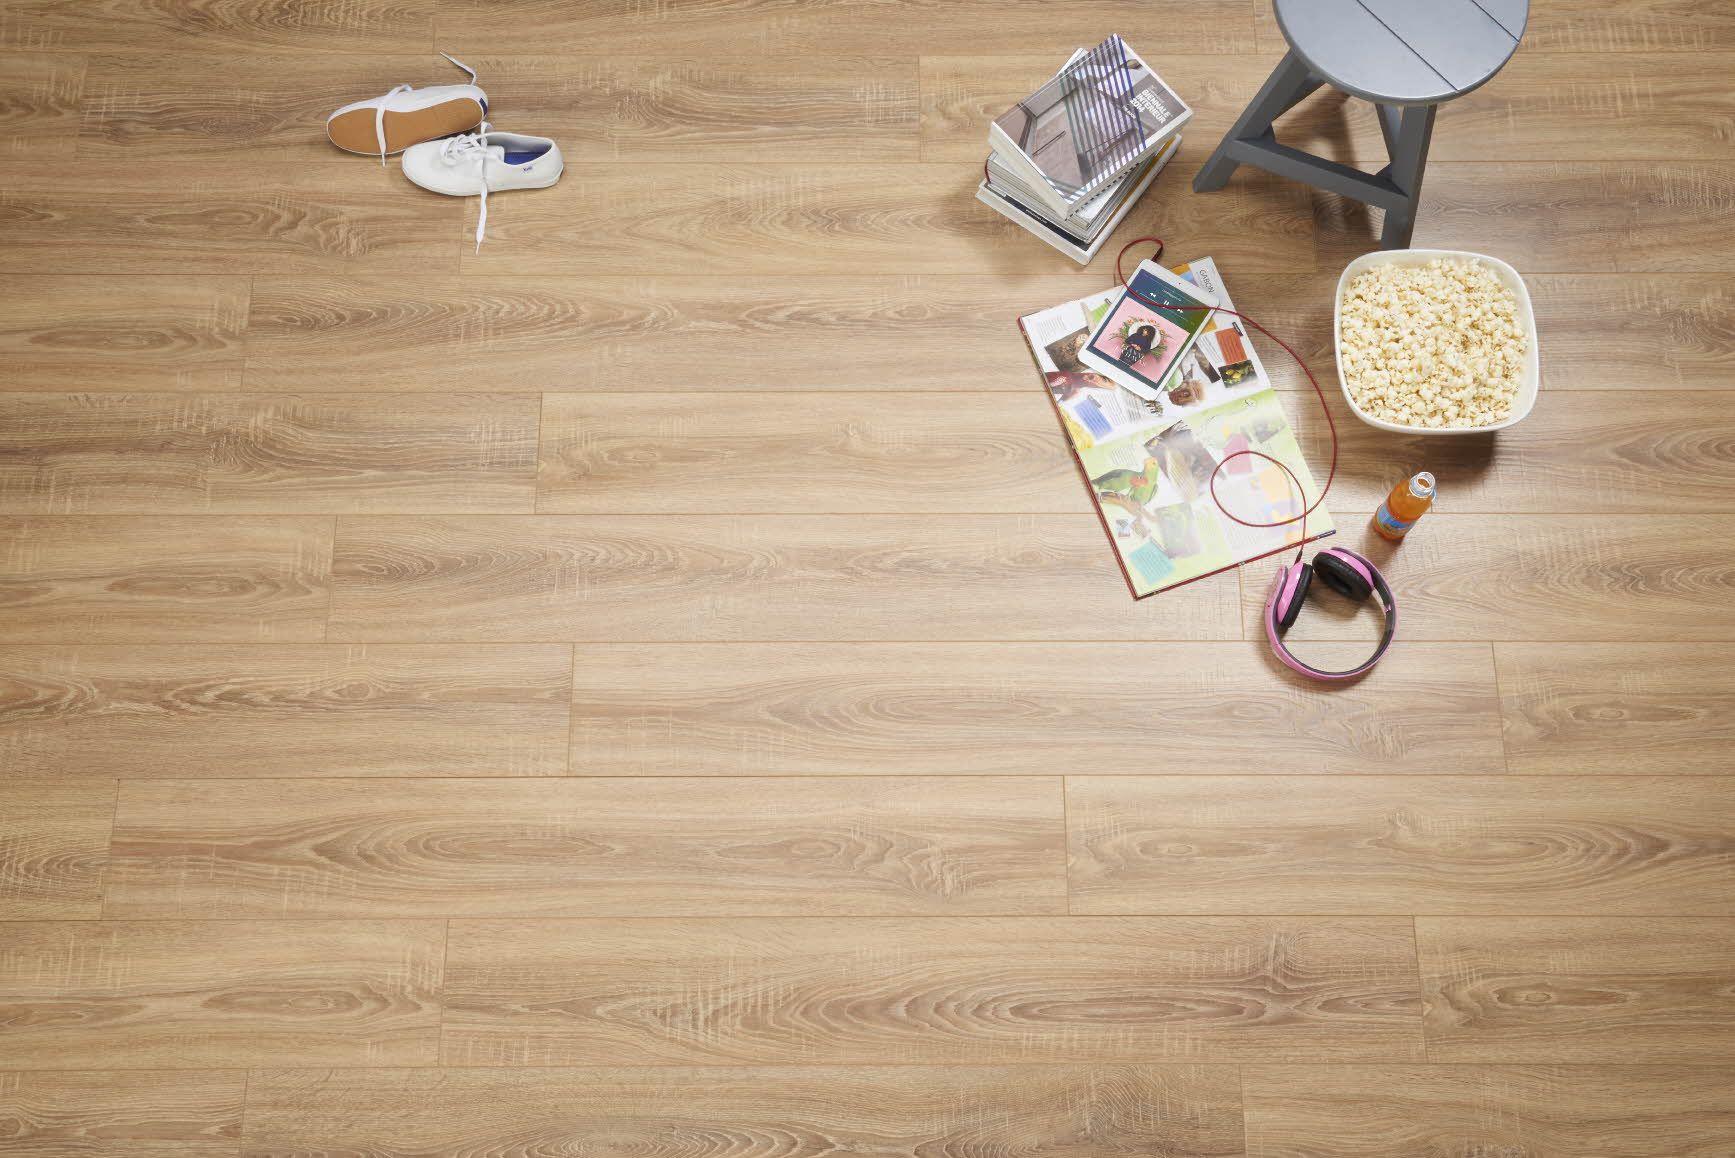 Praxis Laminaat Aanbieding : Praxis laminaatvloeren laminaat leggen in je studentenkamer hier